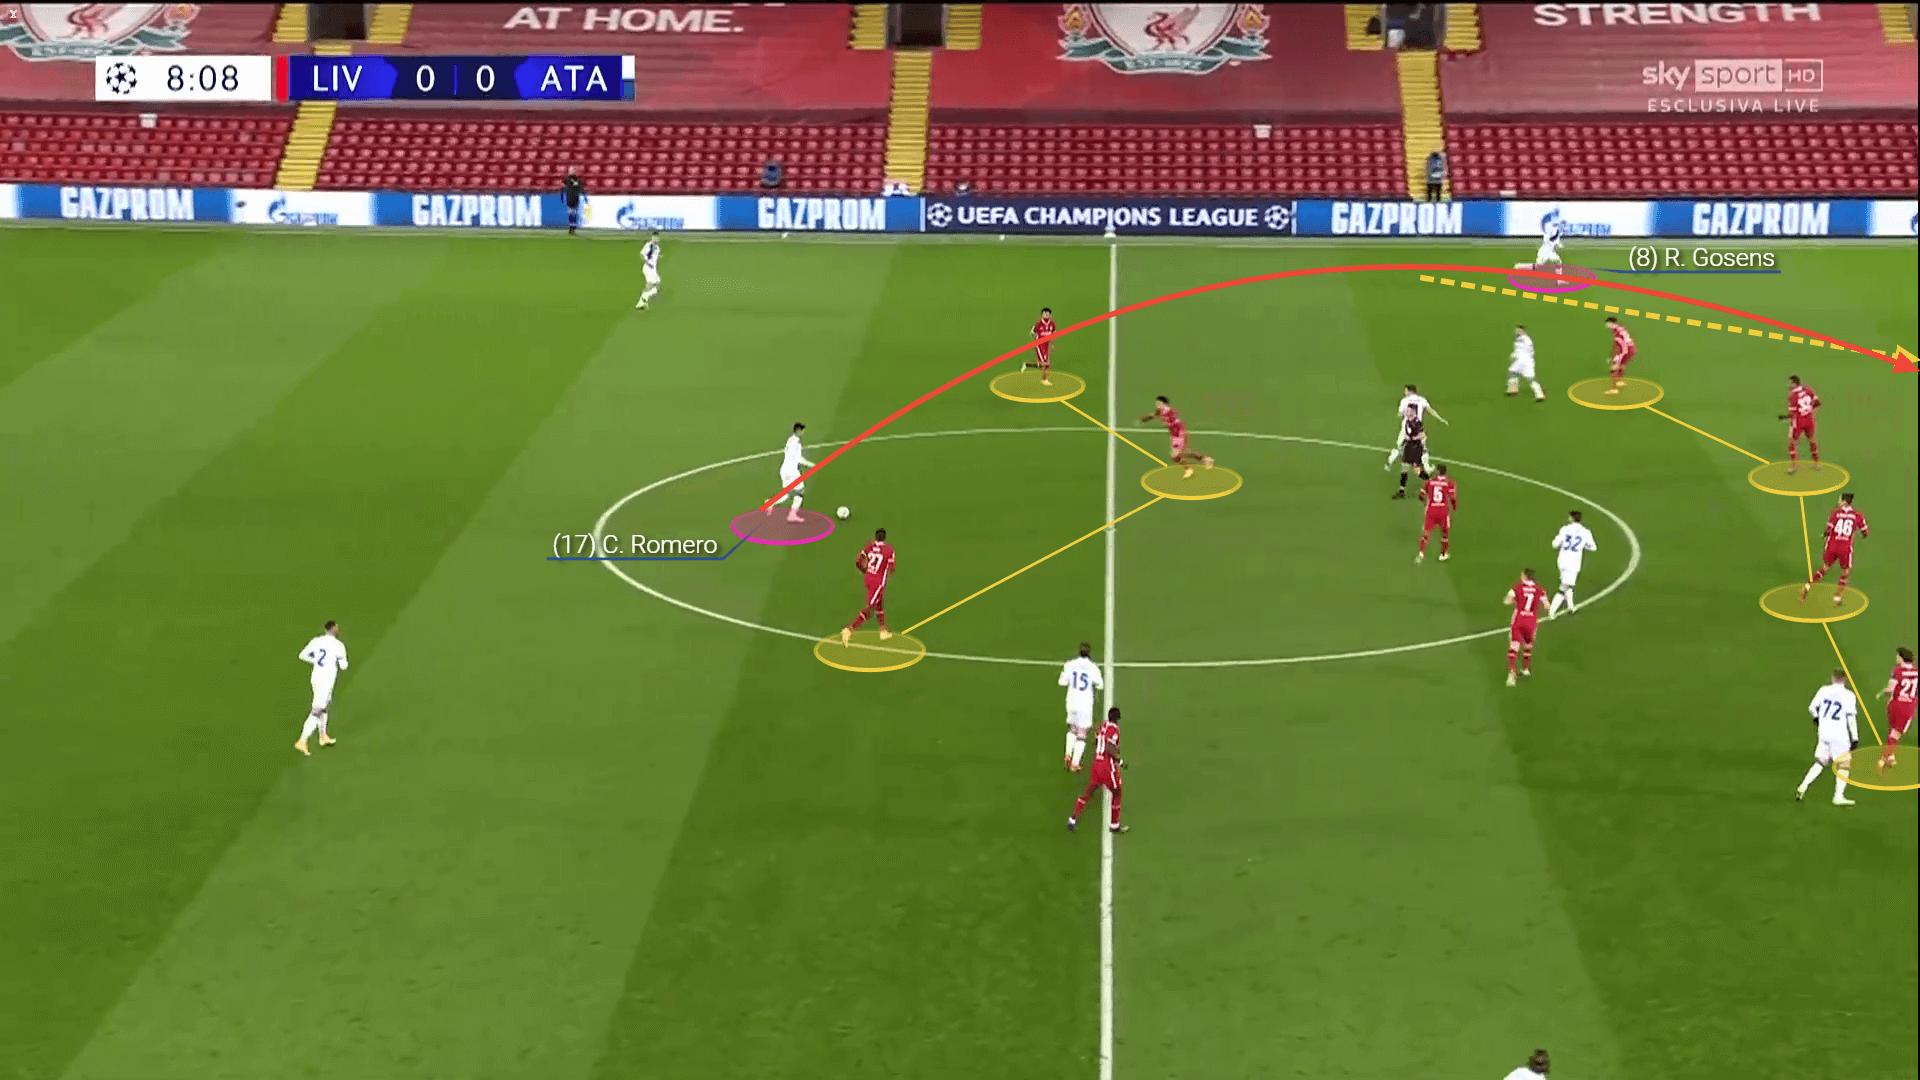 UEFA Champions League 2020/21: How Atalanta's smart tactical choices disarmed Liverpool - tactical analysis tactics